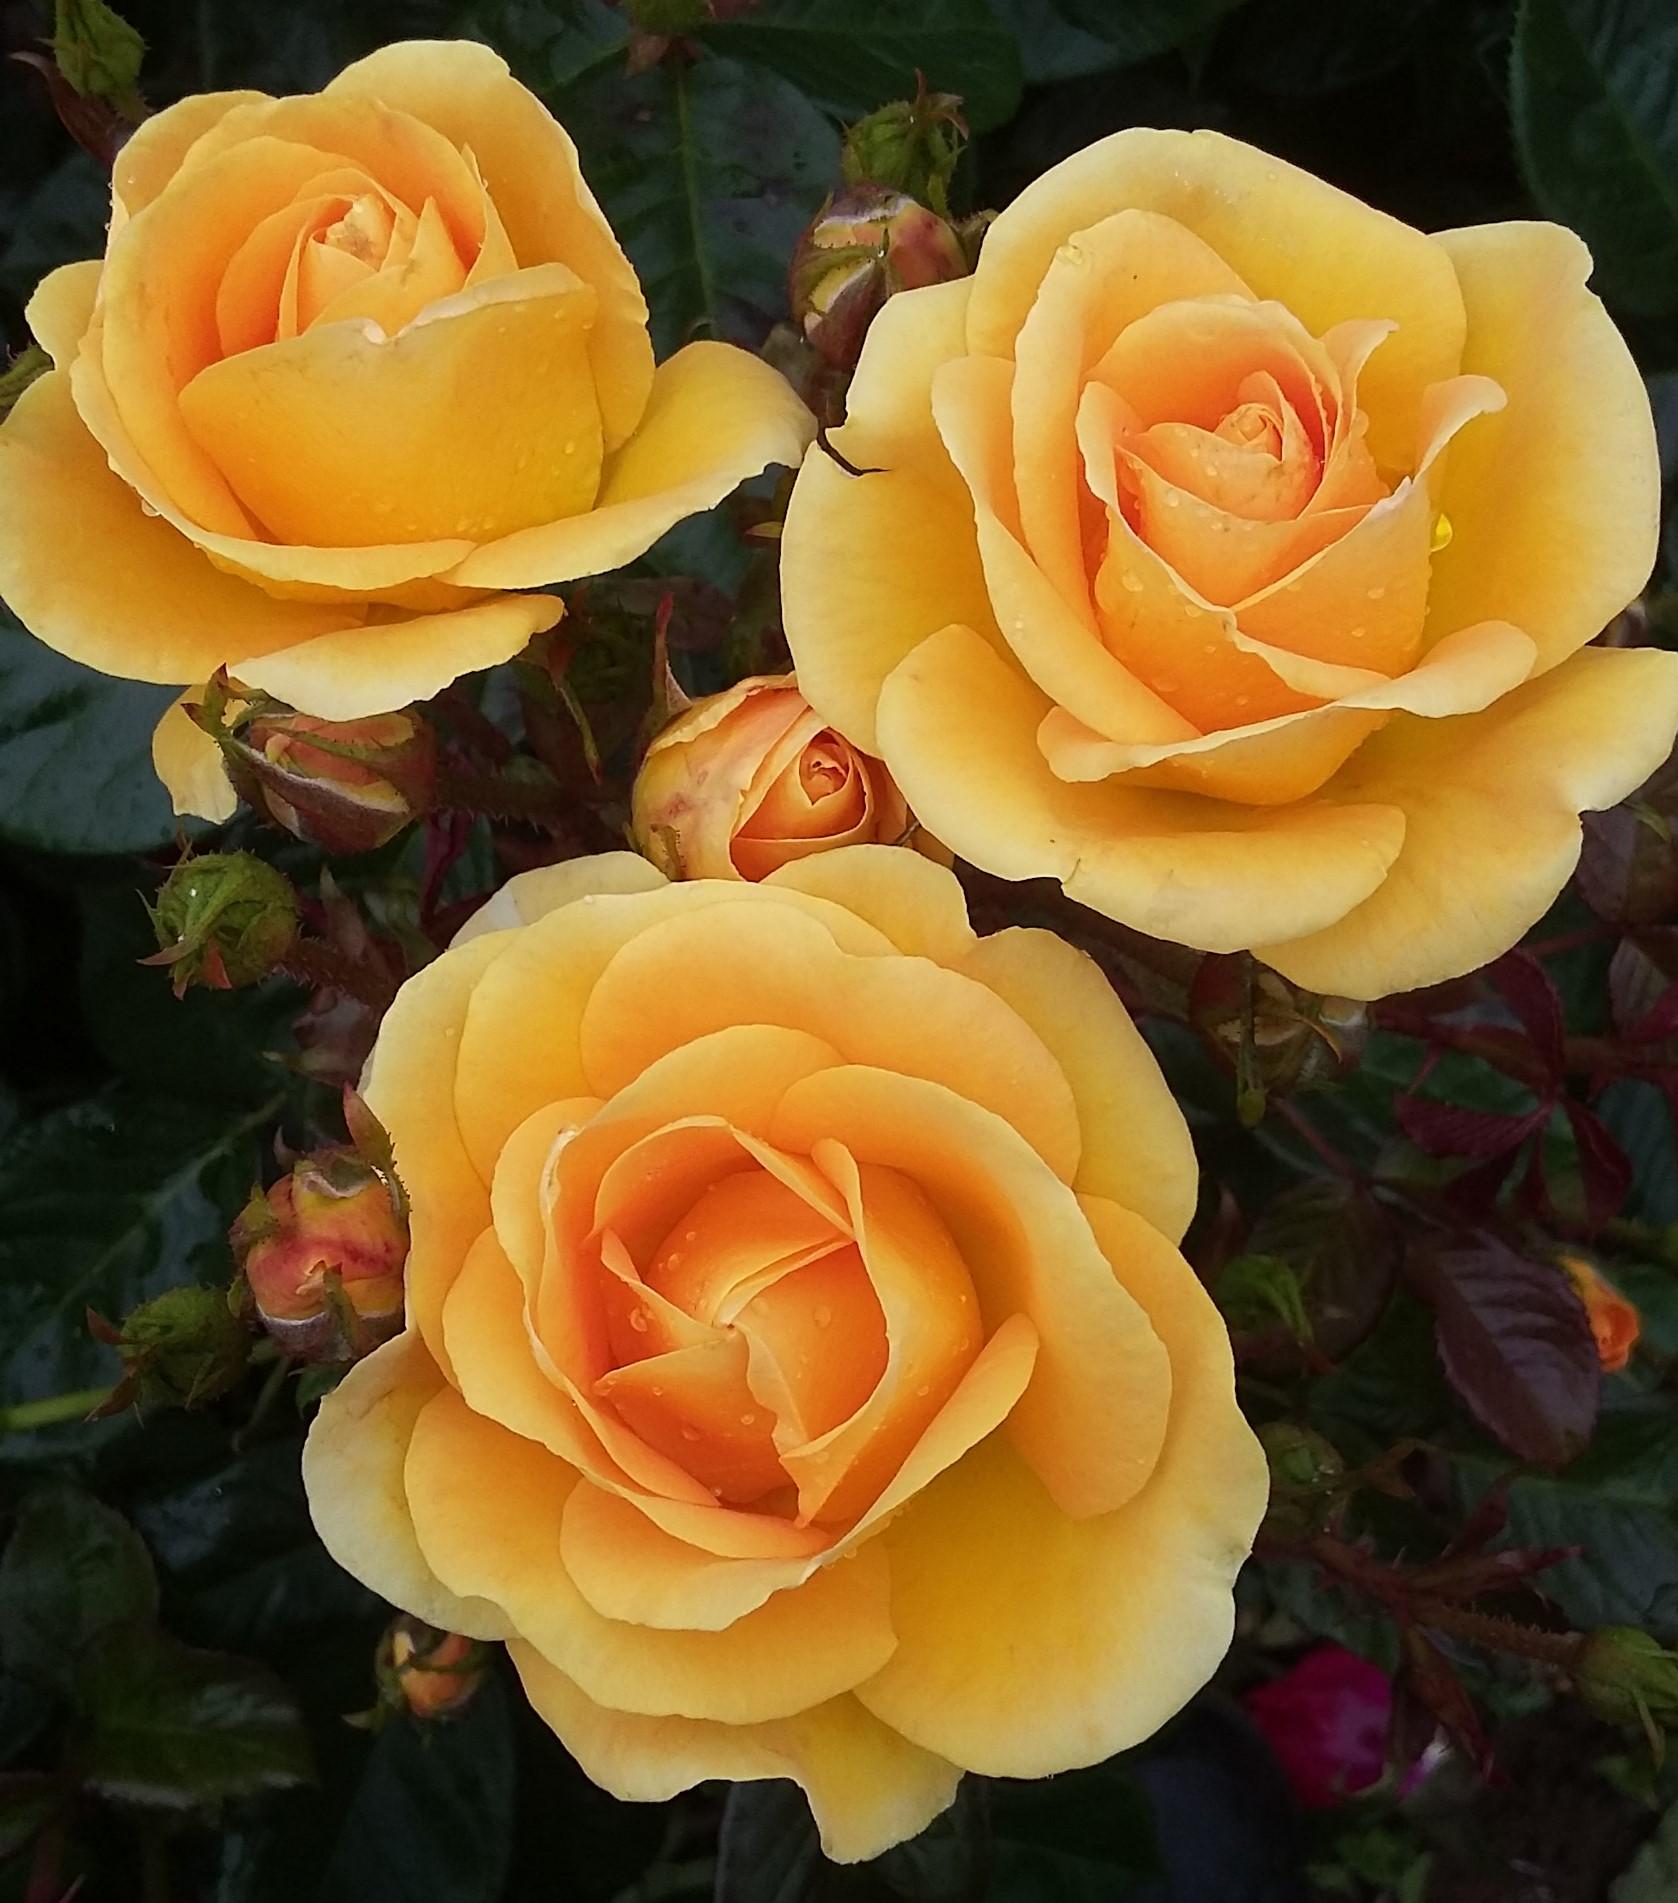 The McFarlane Anniversary Rose